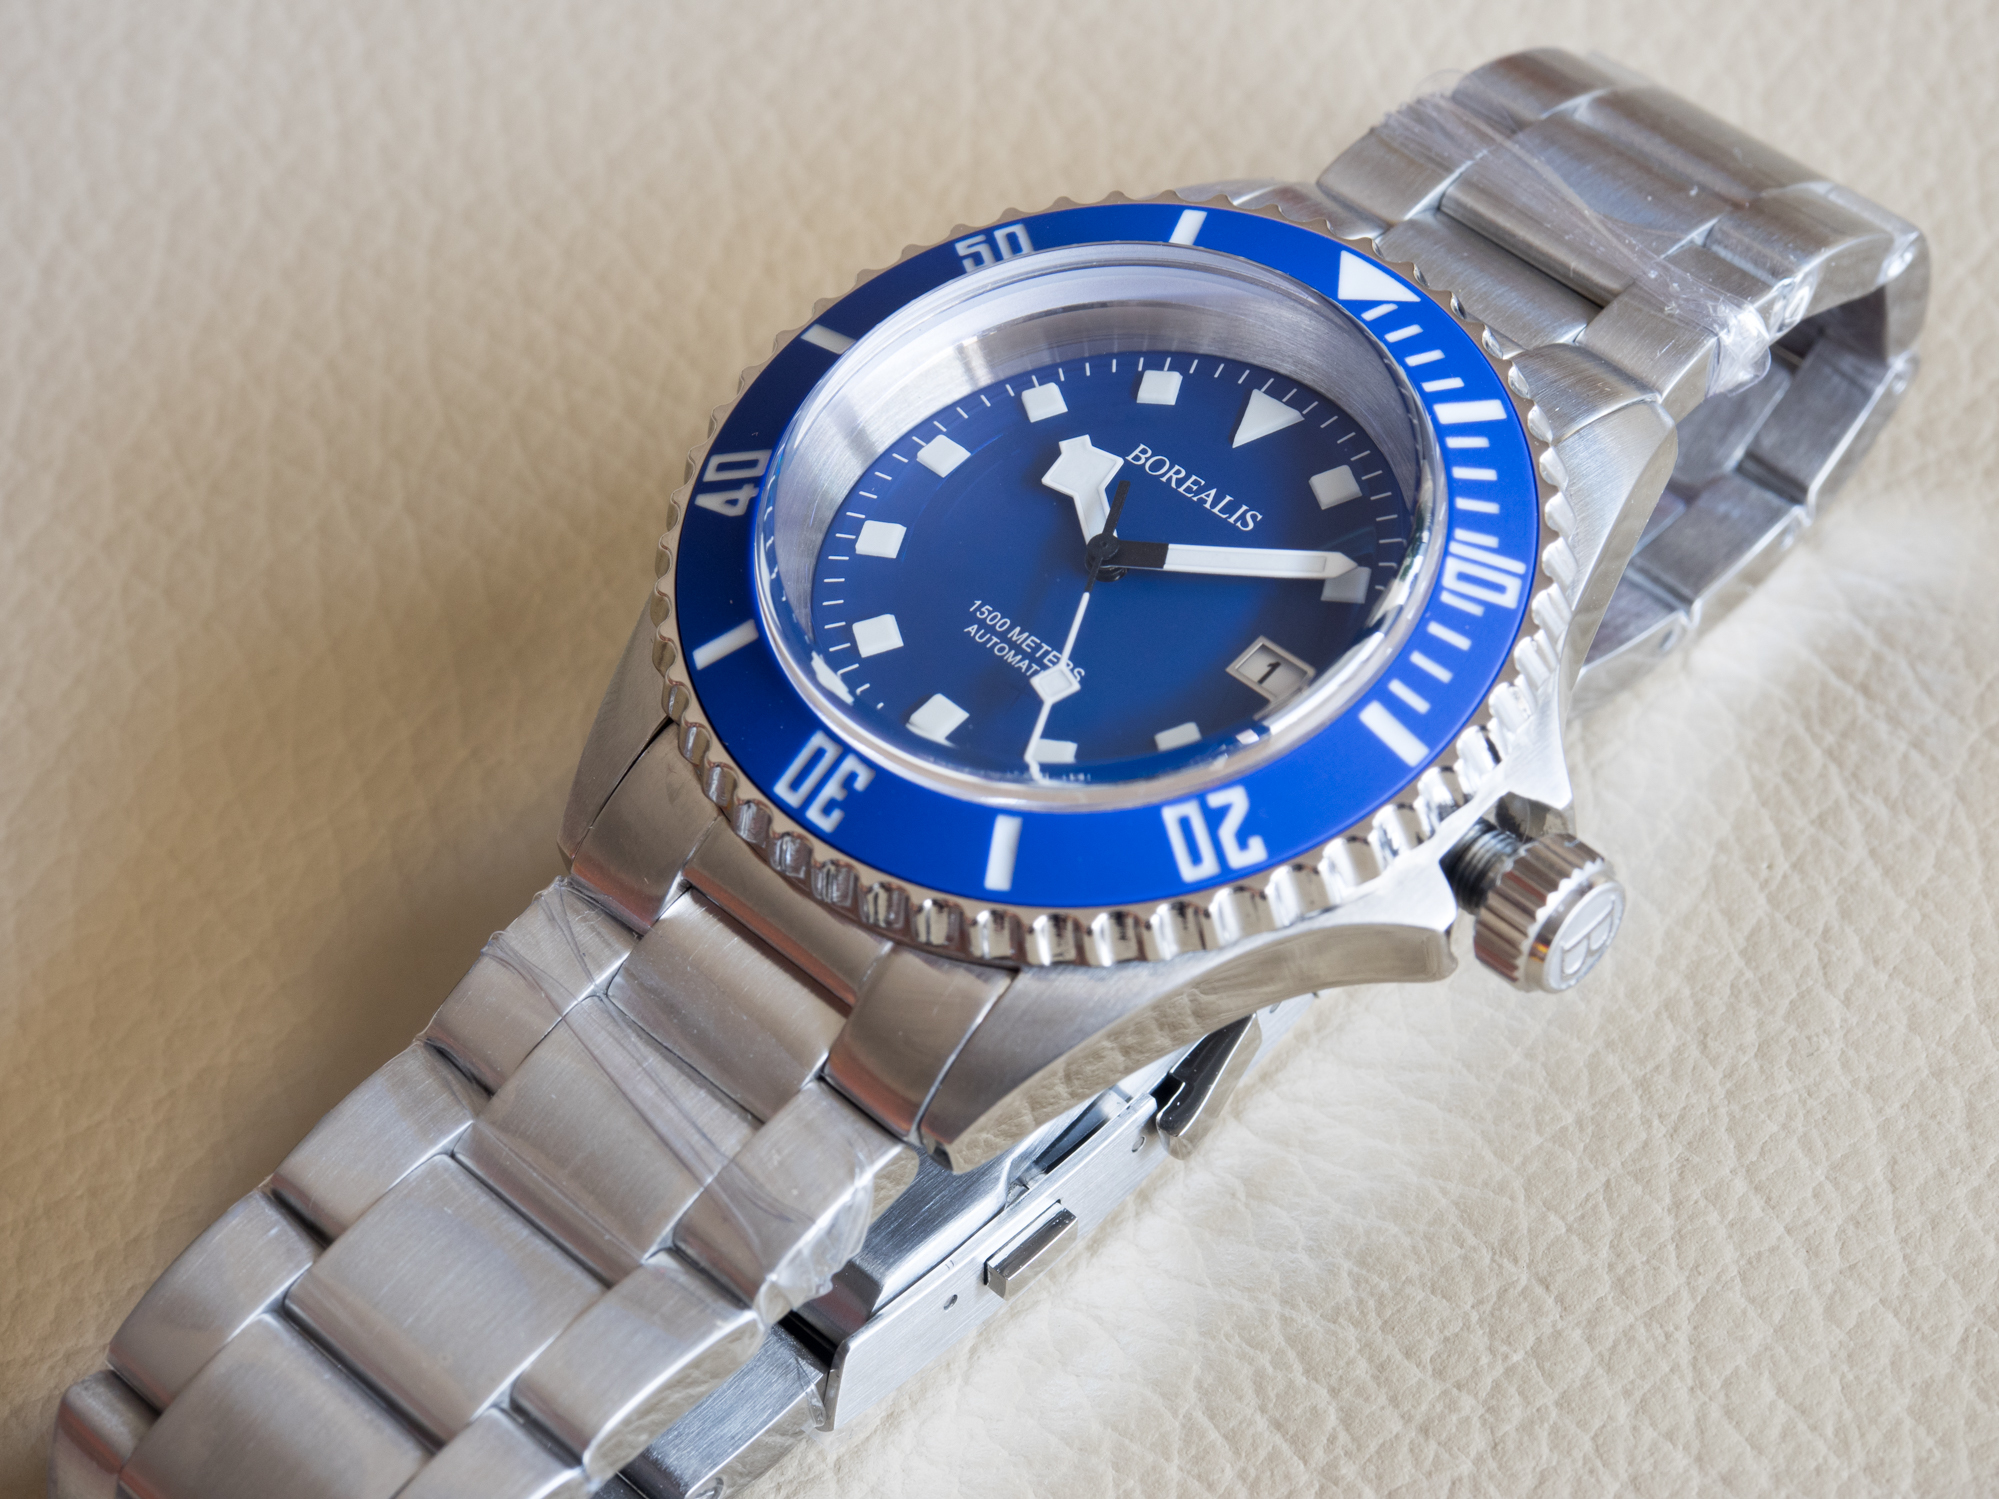 Borealis Sea Hawk 1500m Automatic Diver Watch Seiko NH36 / 4R36 Ceramic Blue Bezel Blue Dial